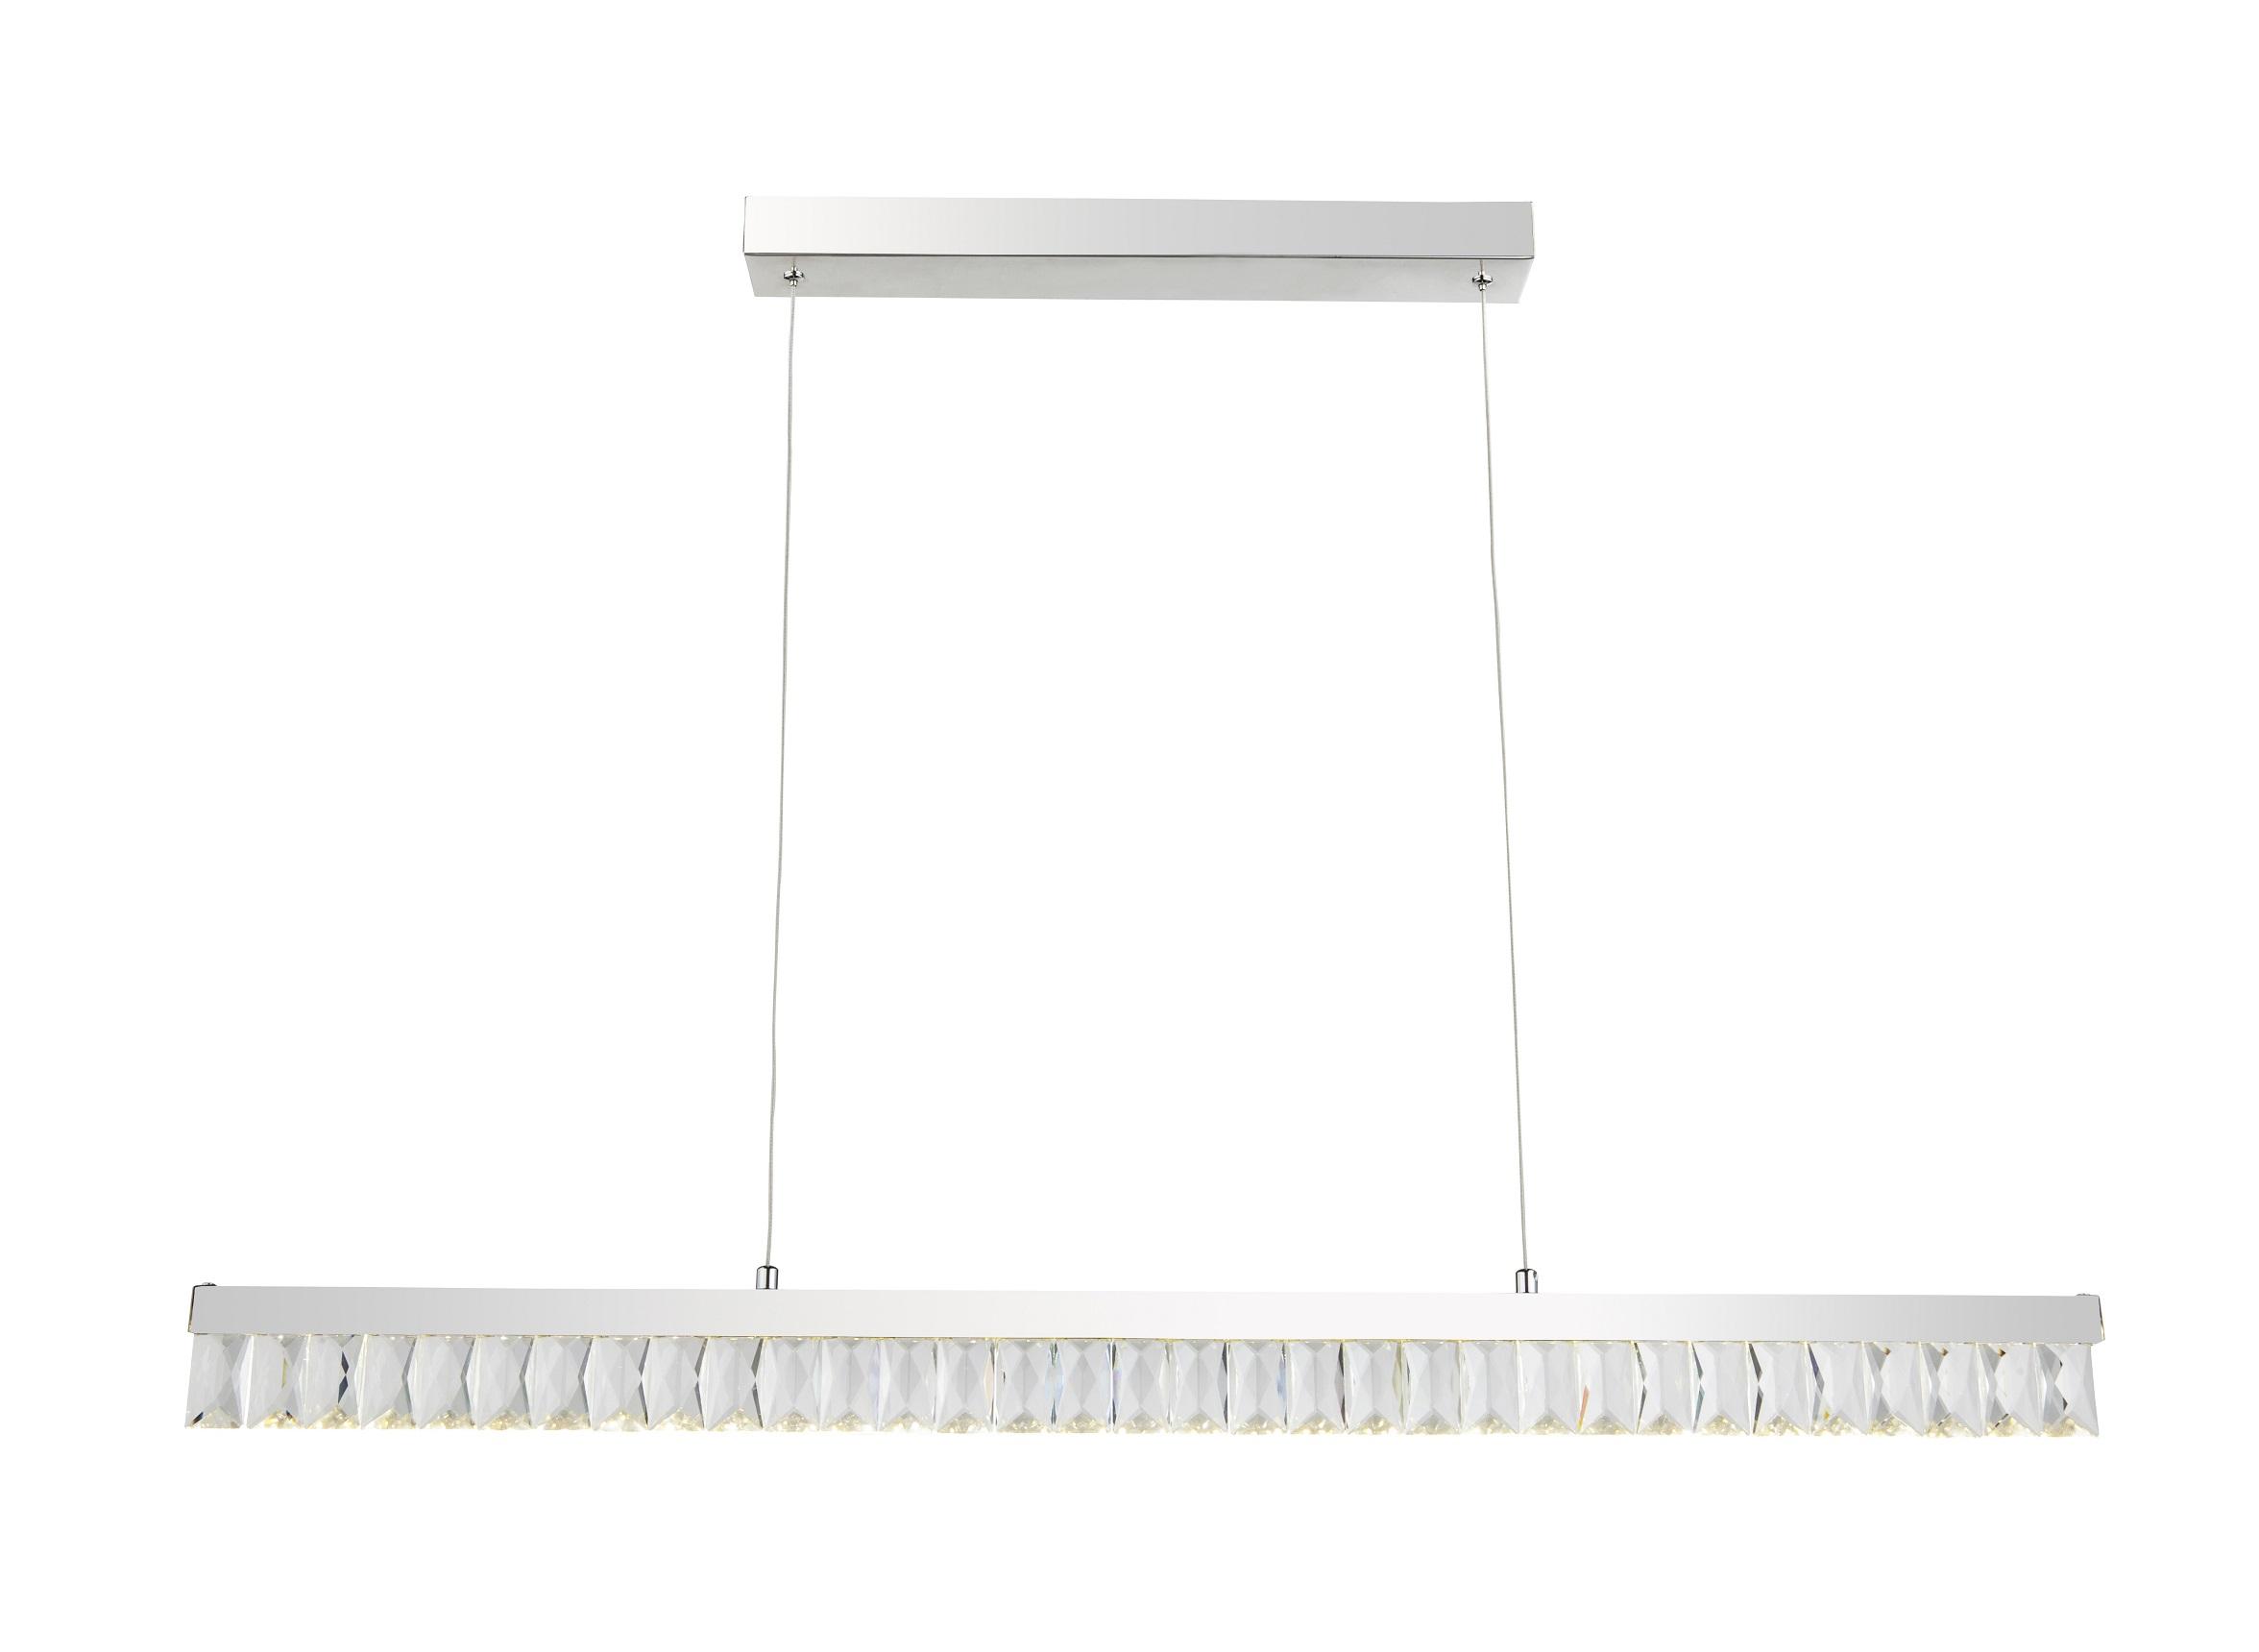 Светильник подвесной Globo 49234-20HПодвесные светильники<br>&amp;lt;div&amp;gt;&amp;lt;div&amp;gt;Вид цоколя: LED&amp;lt;/div&amp;gt;&amp;lt;div&amp;gt;Мощность: &amp;amp;nbsp;20W&amp;lt;/div&amp;gt;&amp;lt;div&amp;gt;Количество ламп: 1 (в комплекте)&amp;lt;/div&amp;gt;&amp;lt;/div&amp;gt;<br><br>Material: Металл<br>Ширина см: 100<br>Высота см: 120<br>Глубина см: 6